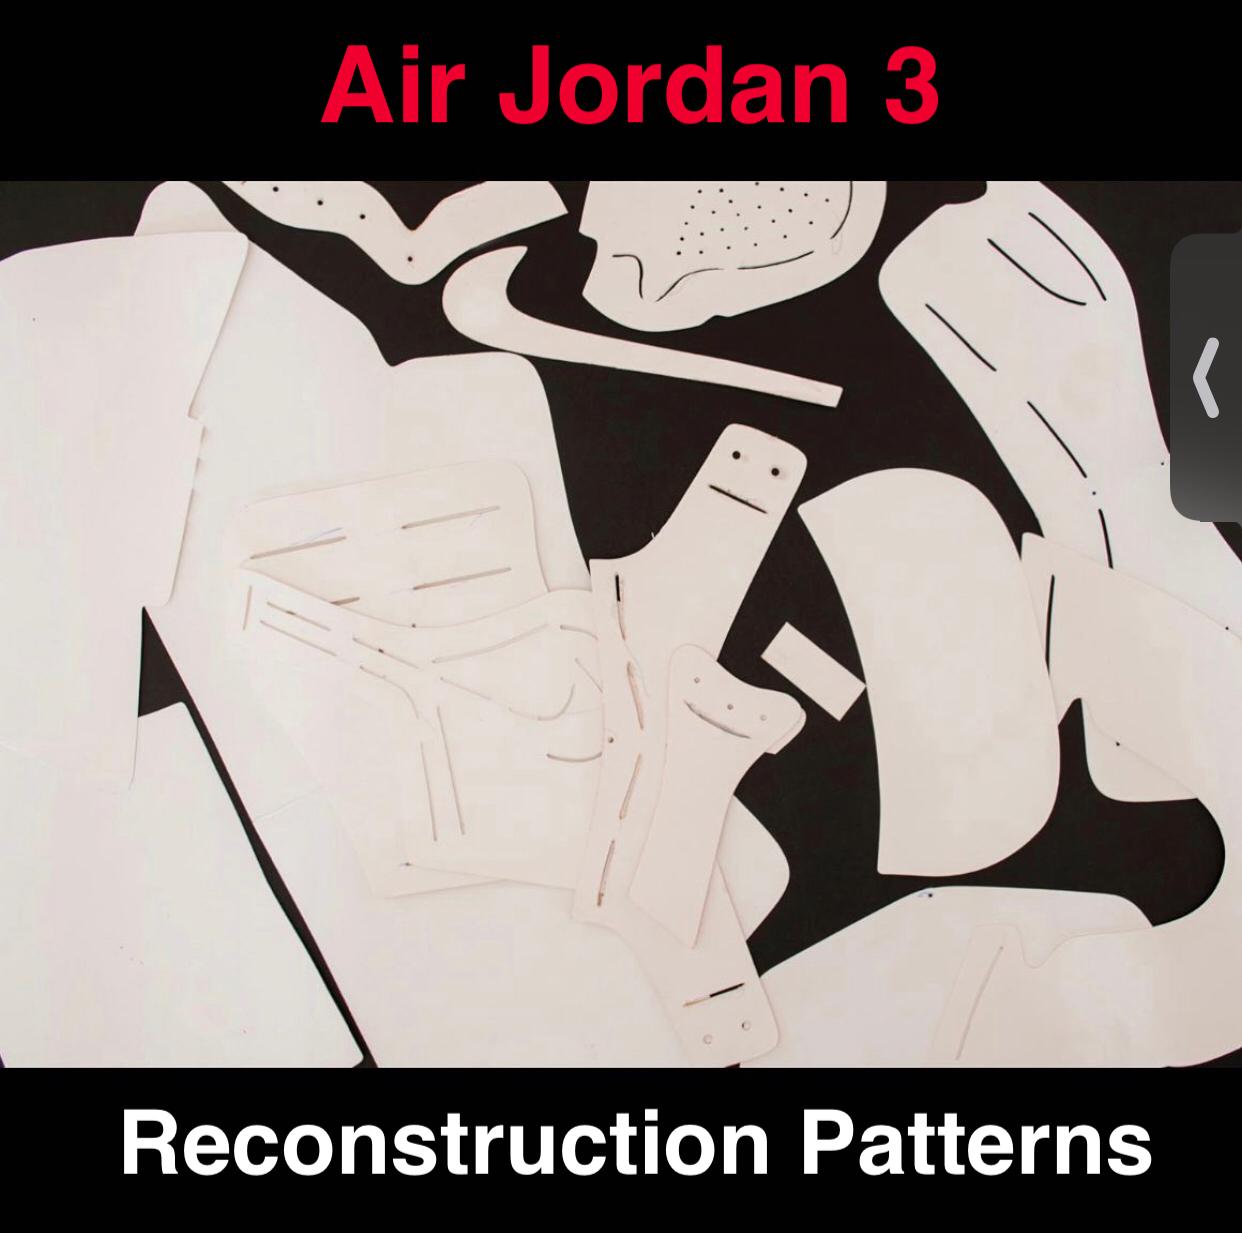 Jordan 3 Paper Patterns to Reconstruct Shoes